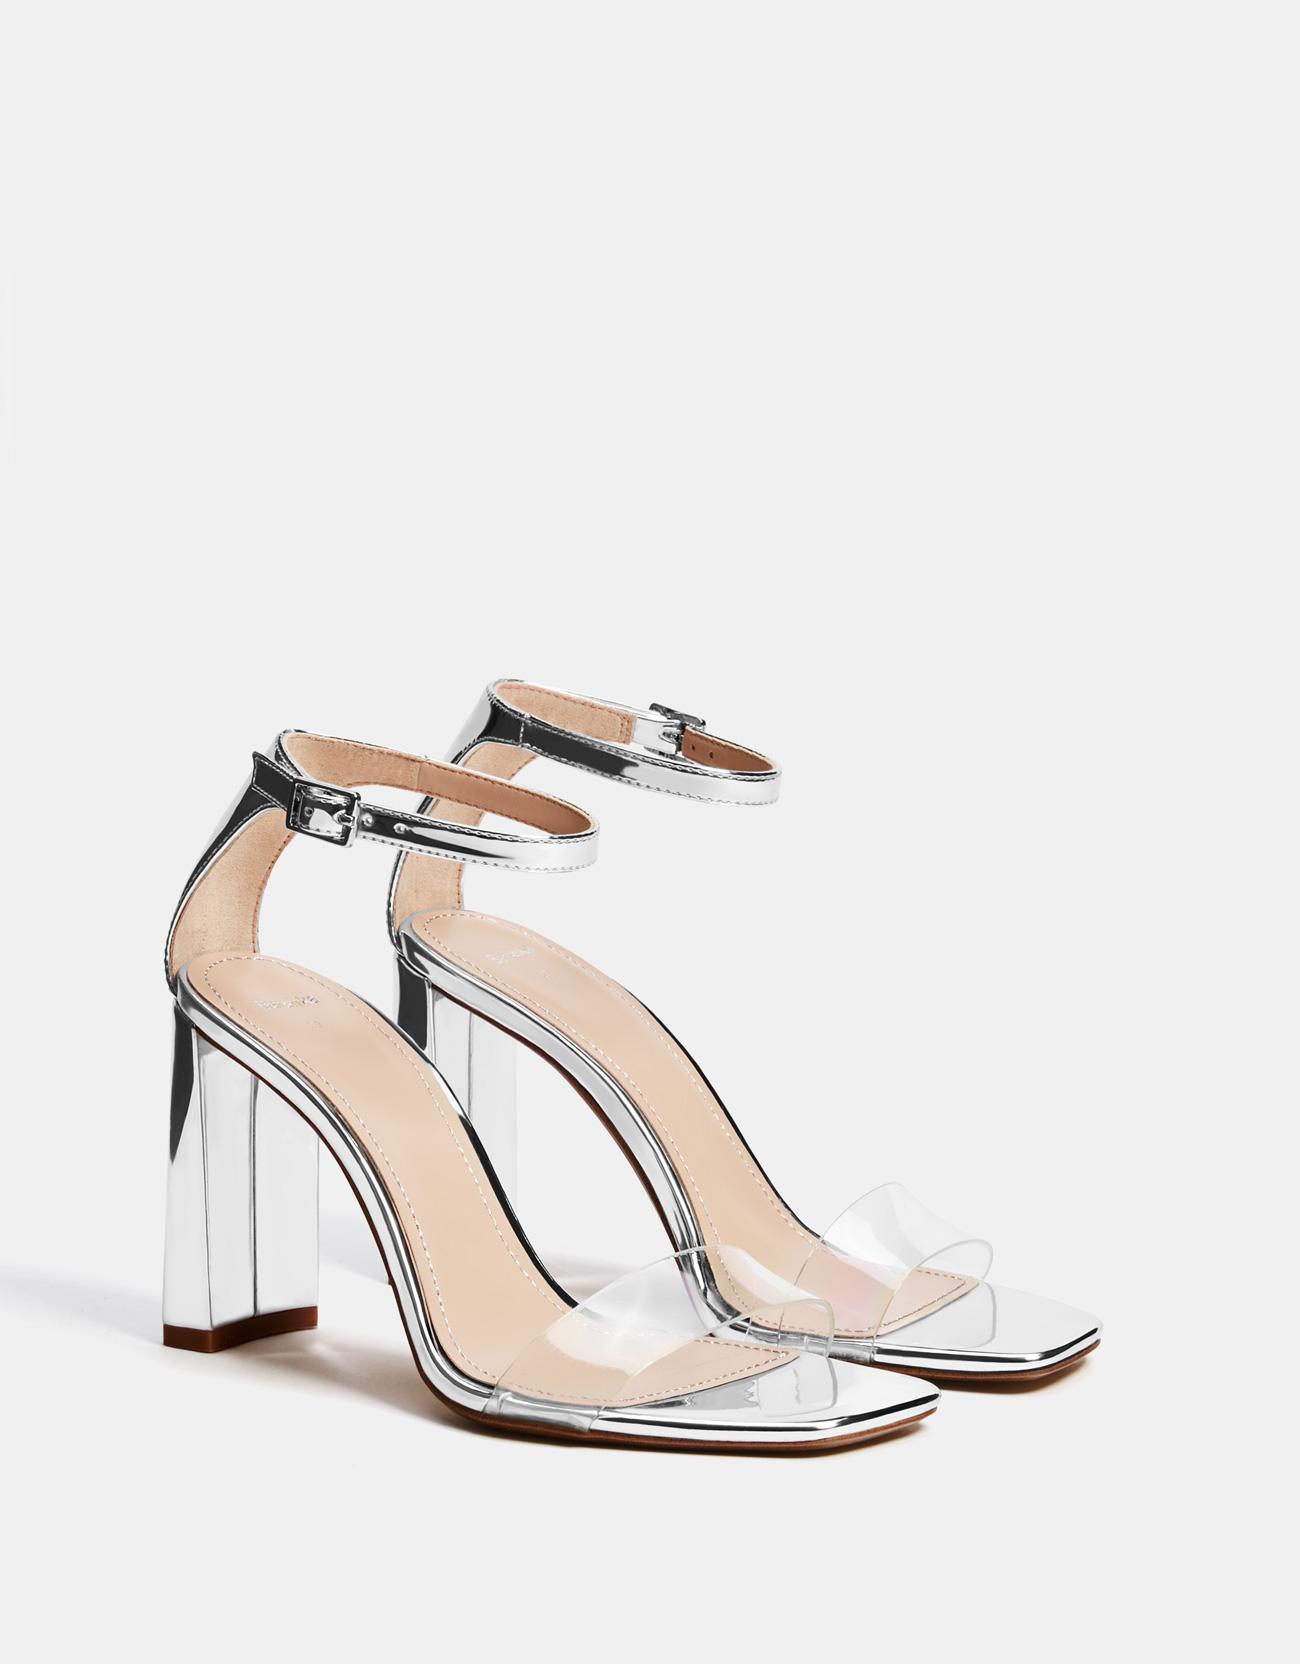 fb850a9d025 Metallic high-heel sandals with vinyl strap - Wedges and Platforms -  Bershka Portugal